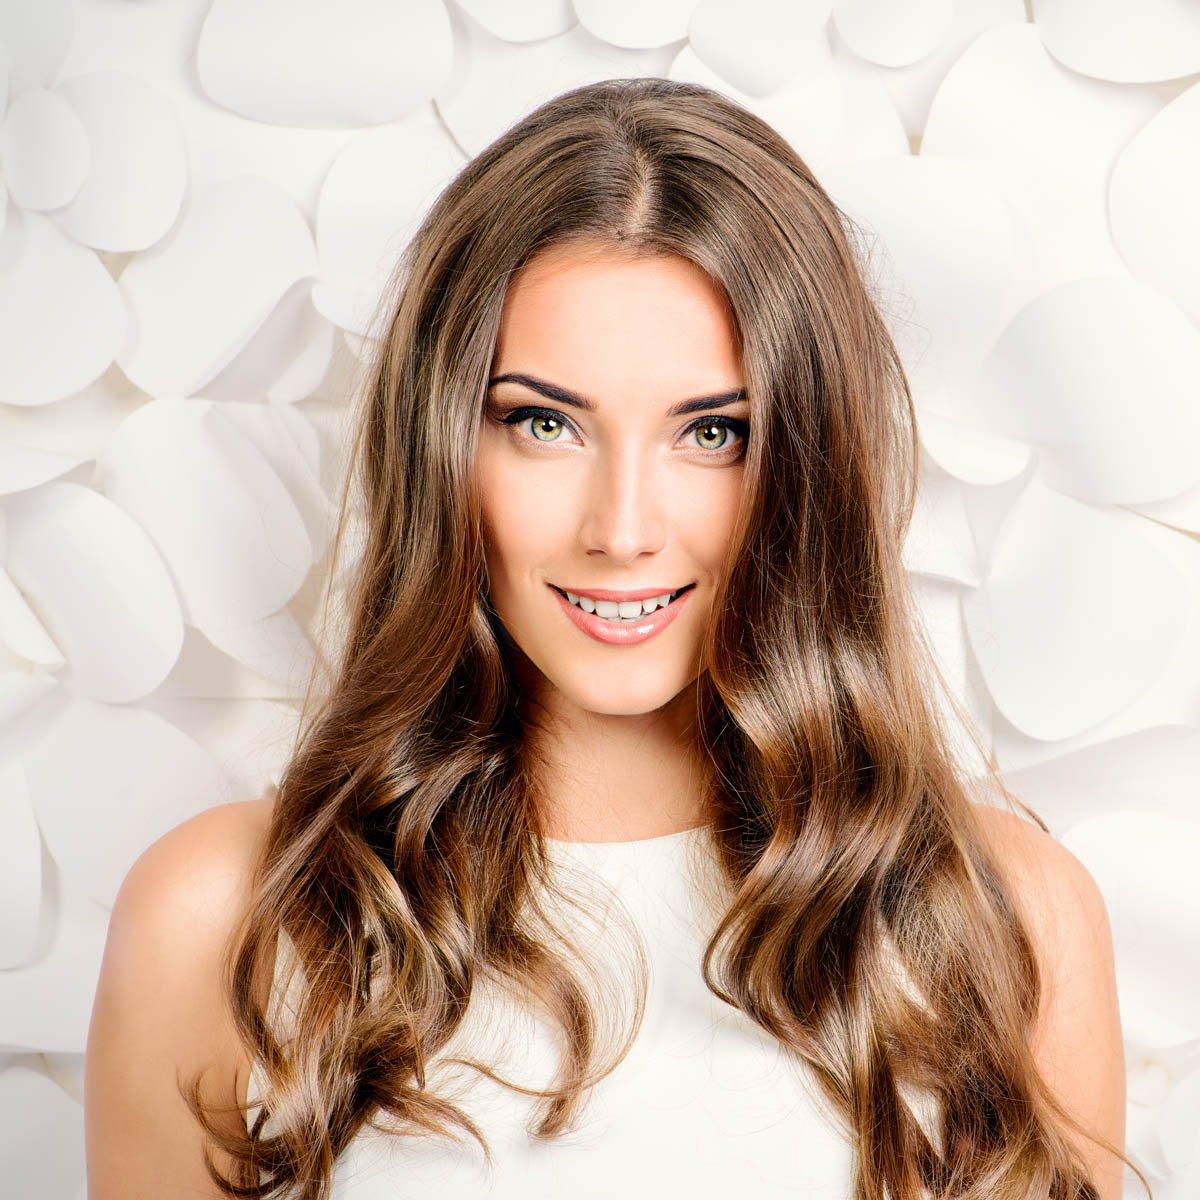 Karboksyterapia na zmarszczki Beauty Address